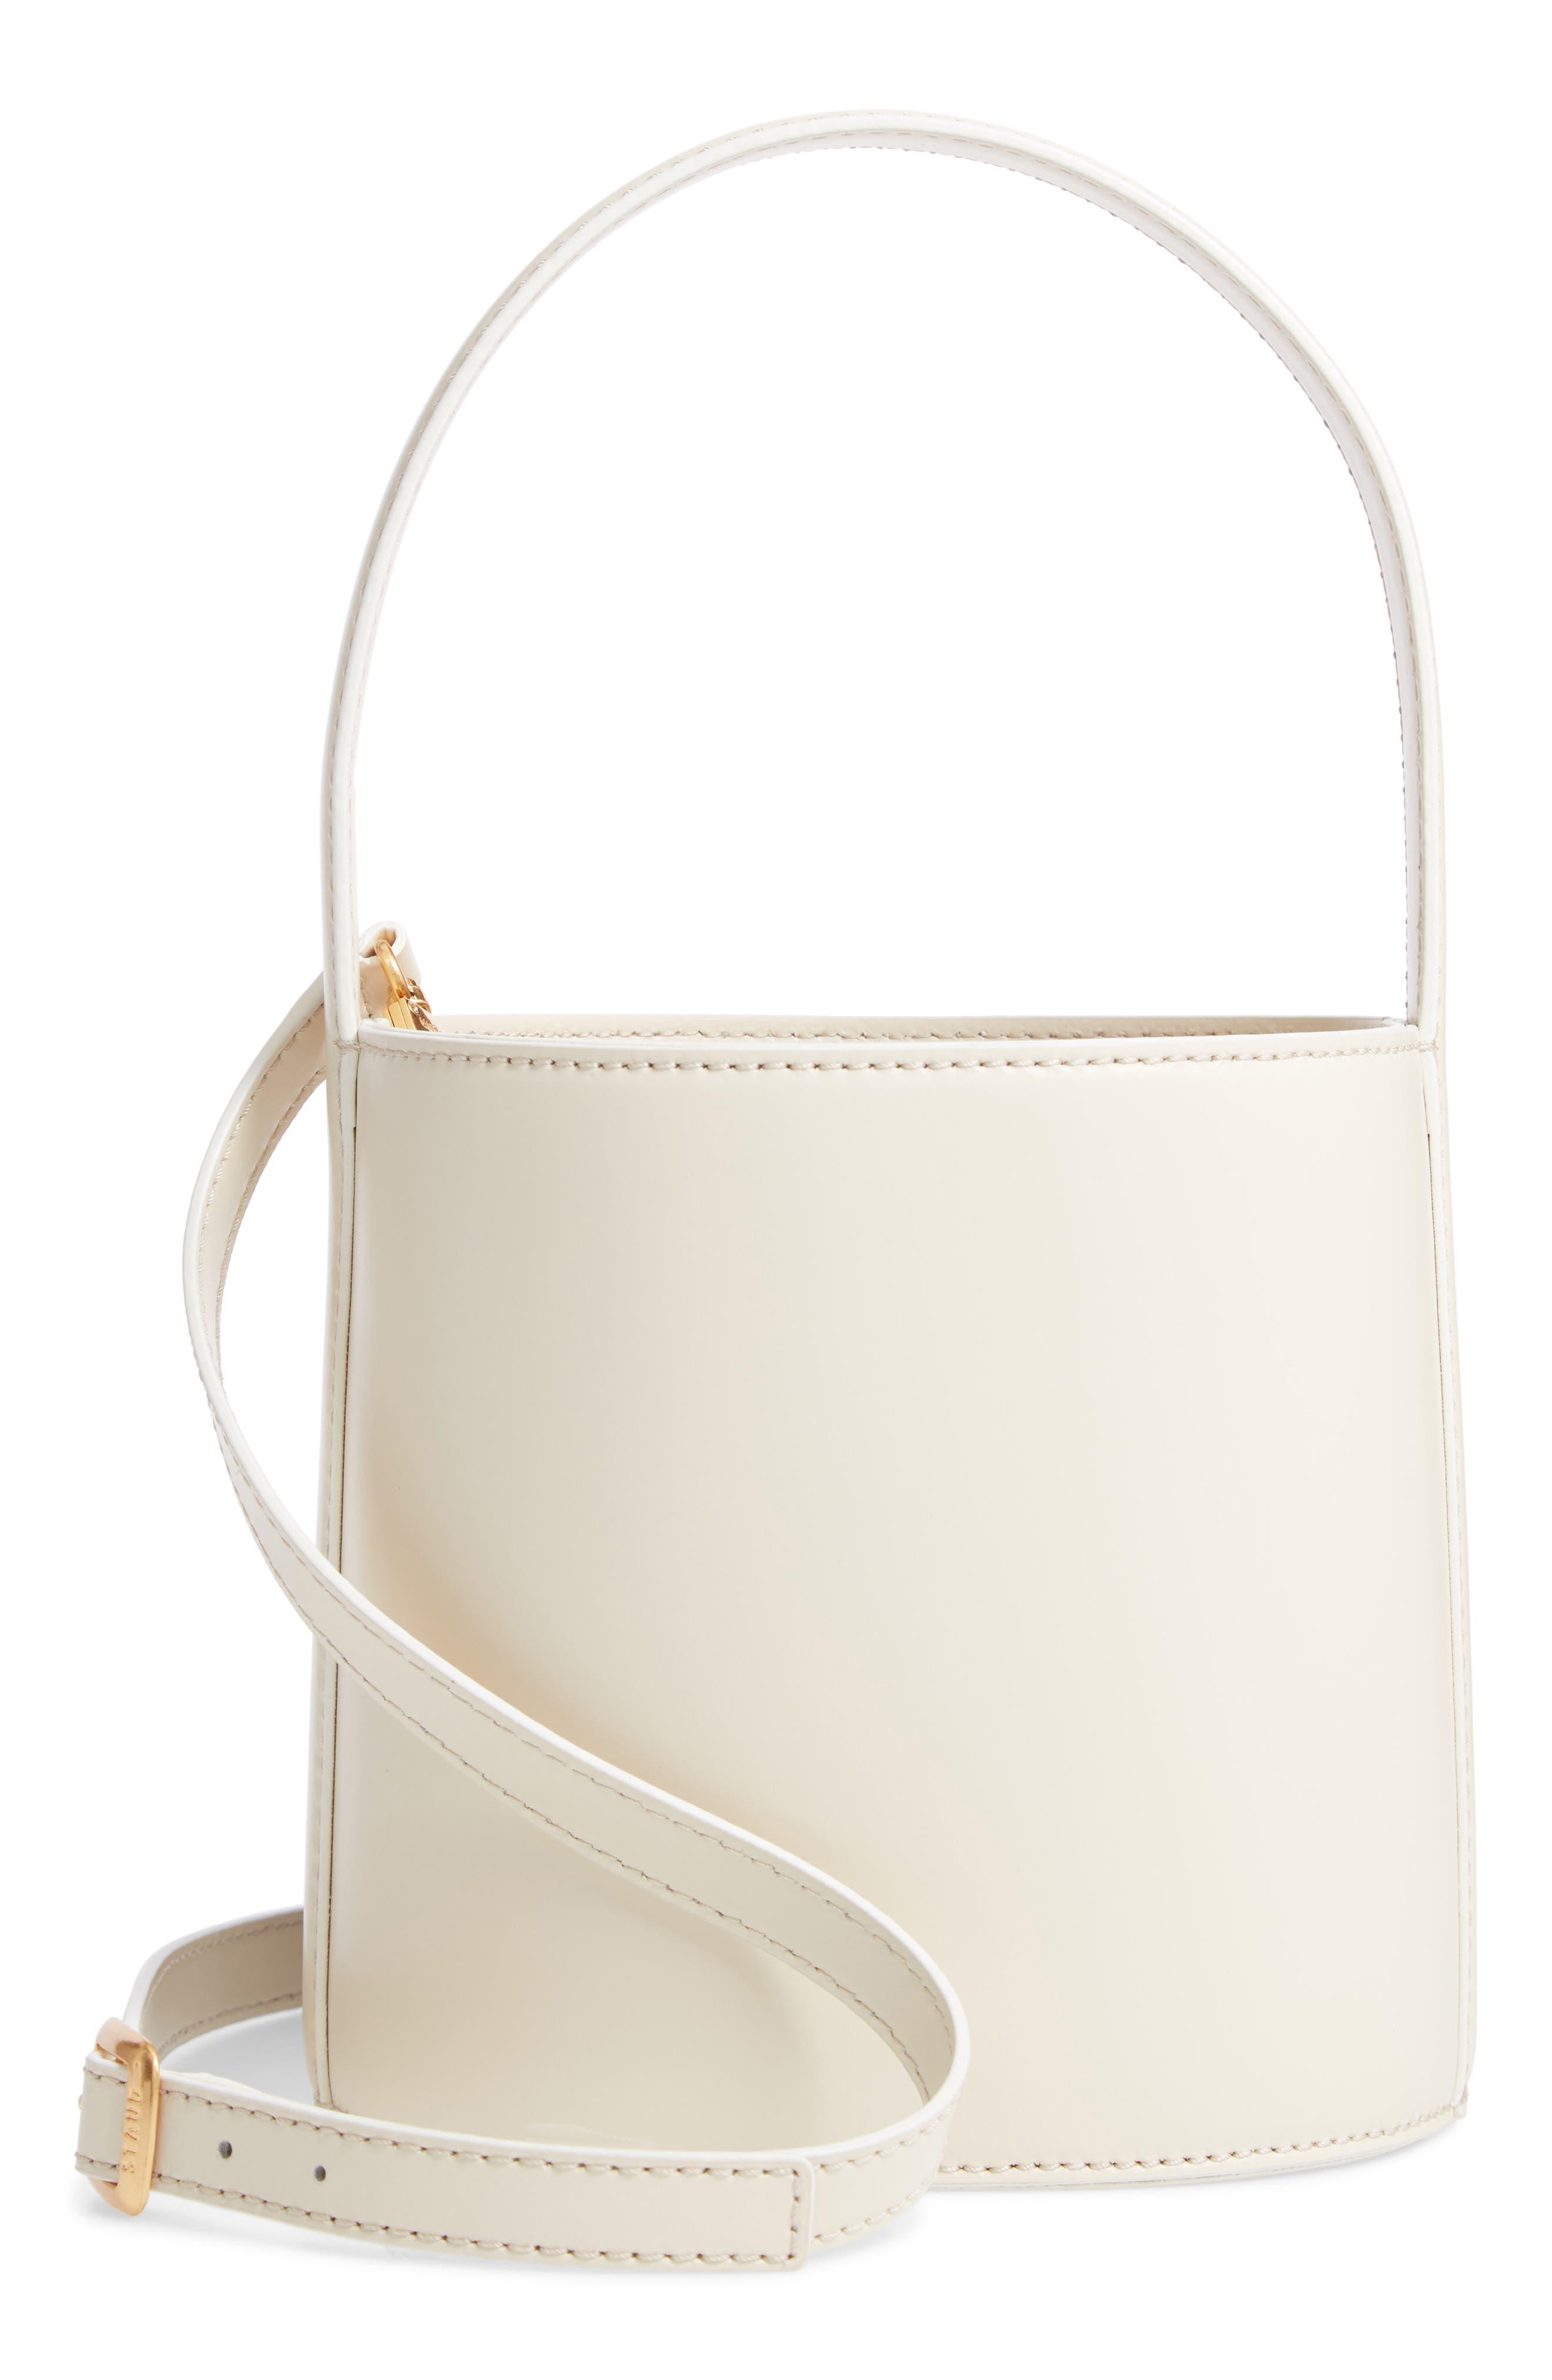 Bissett Leather Bucket Bag - Ivory in Cream